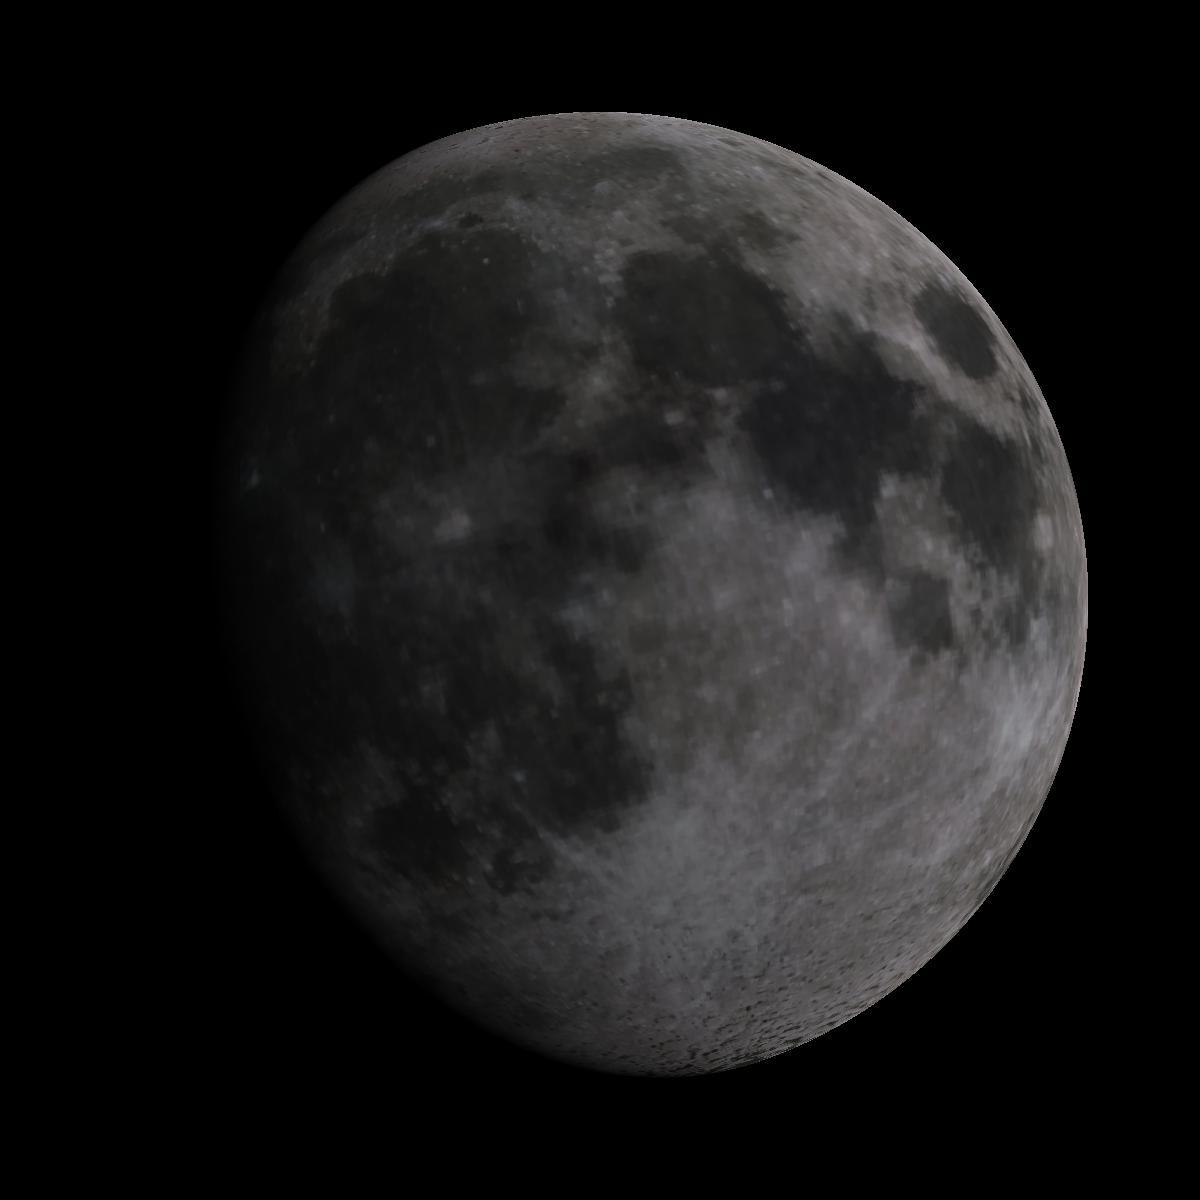 Lune du 7 mars 2020